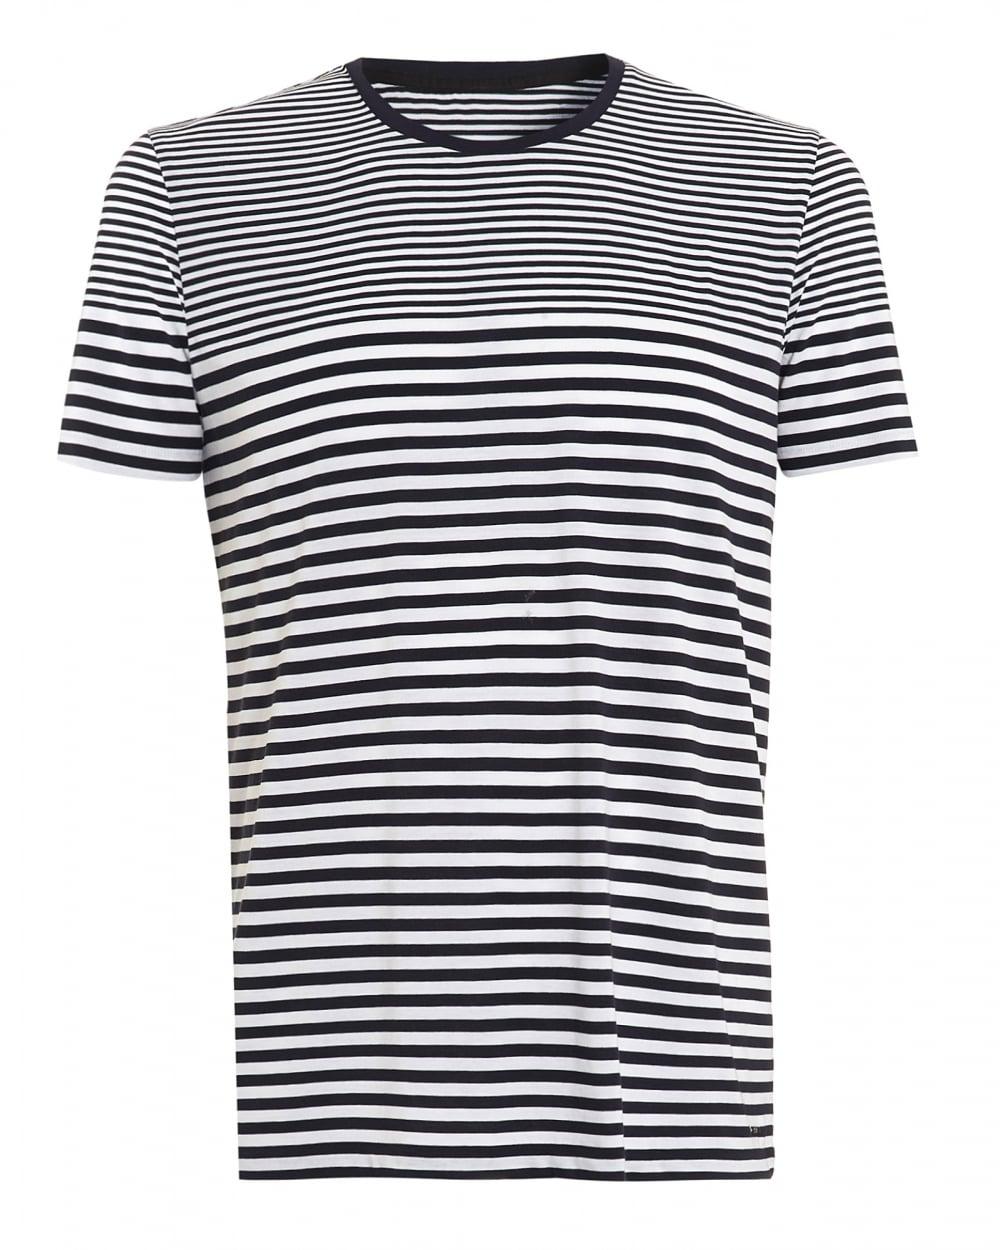 b51227bf0 Hugo Boss Black Mens Tesser 49-WS T-Shirt, Striped Navy White Tee